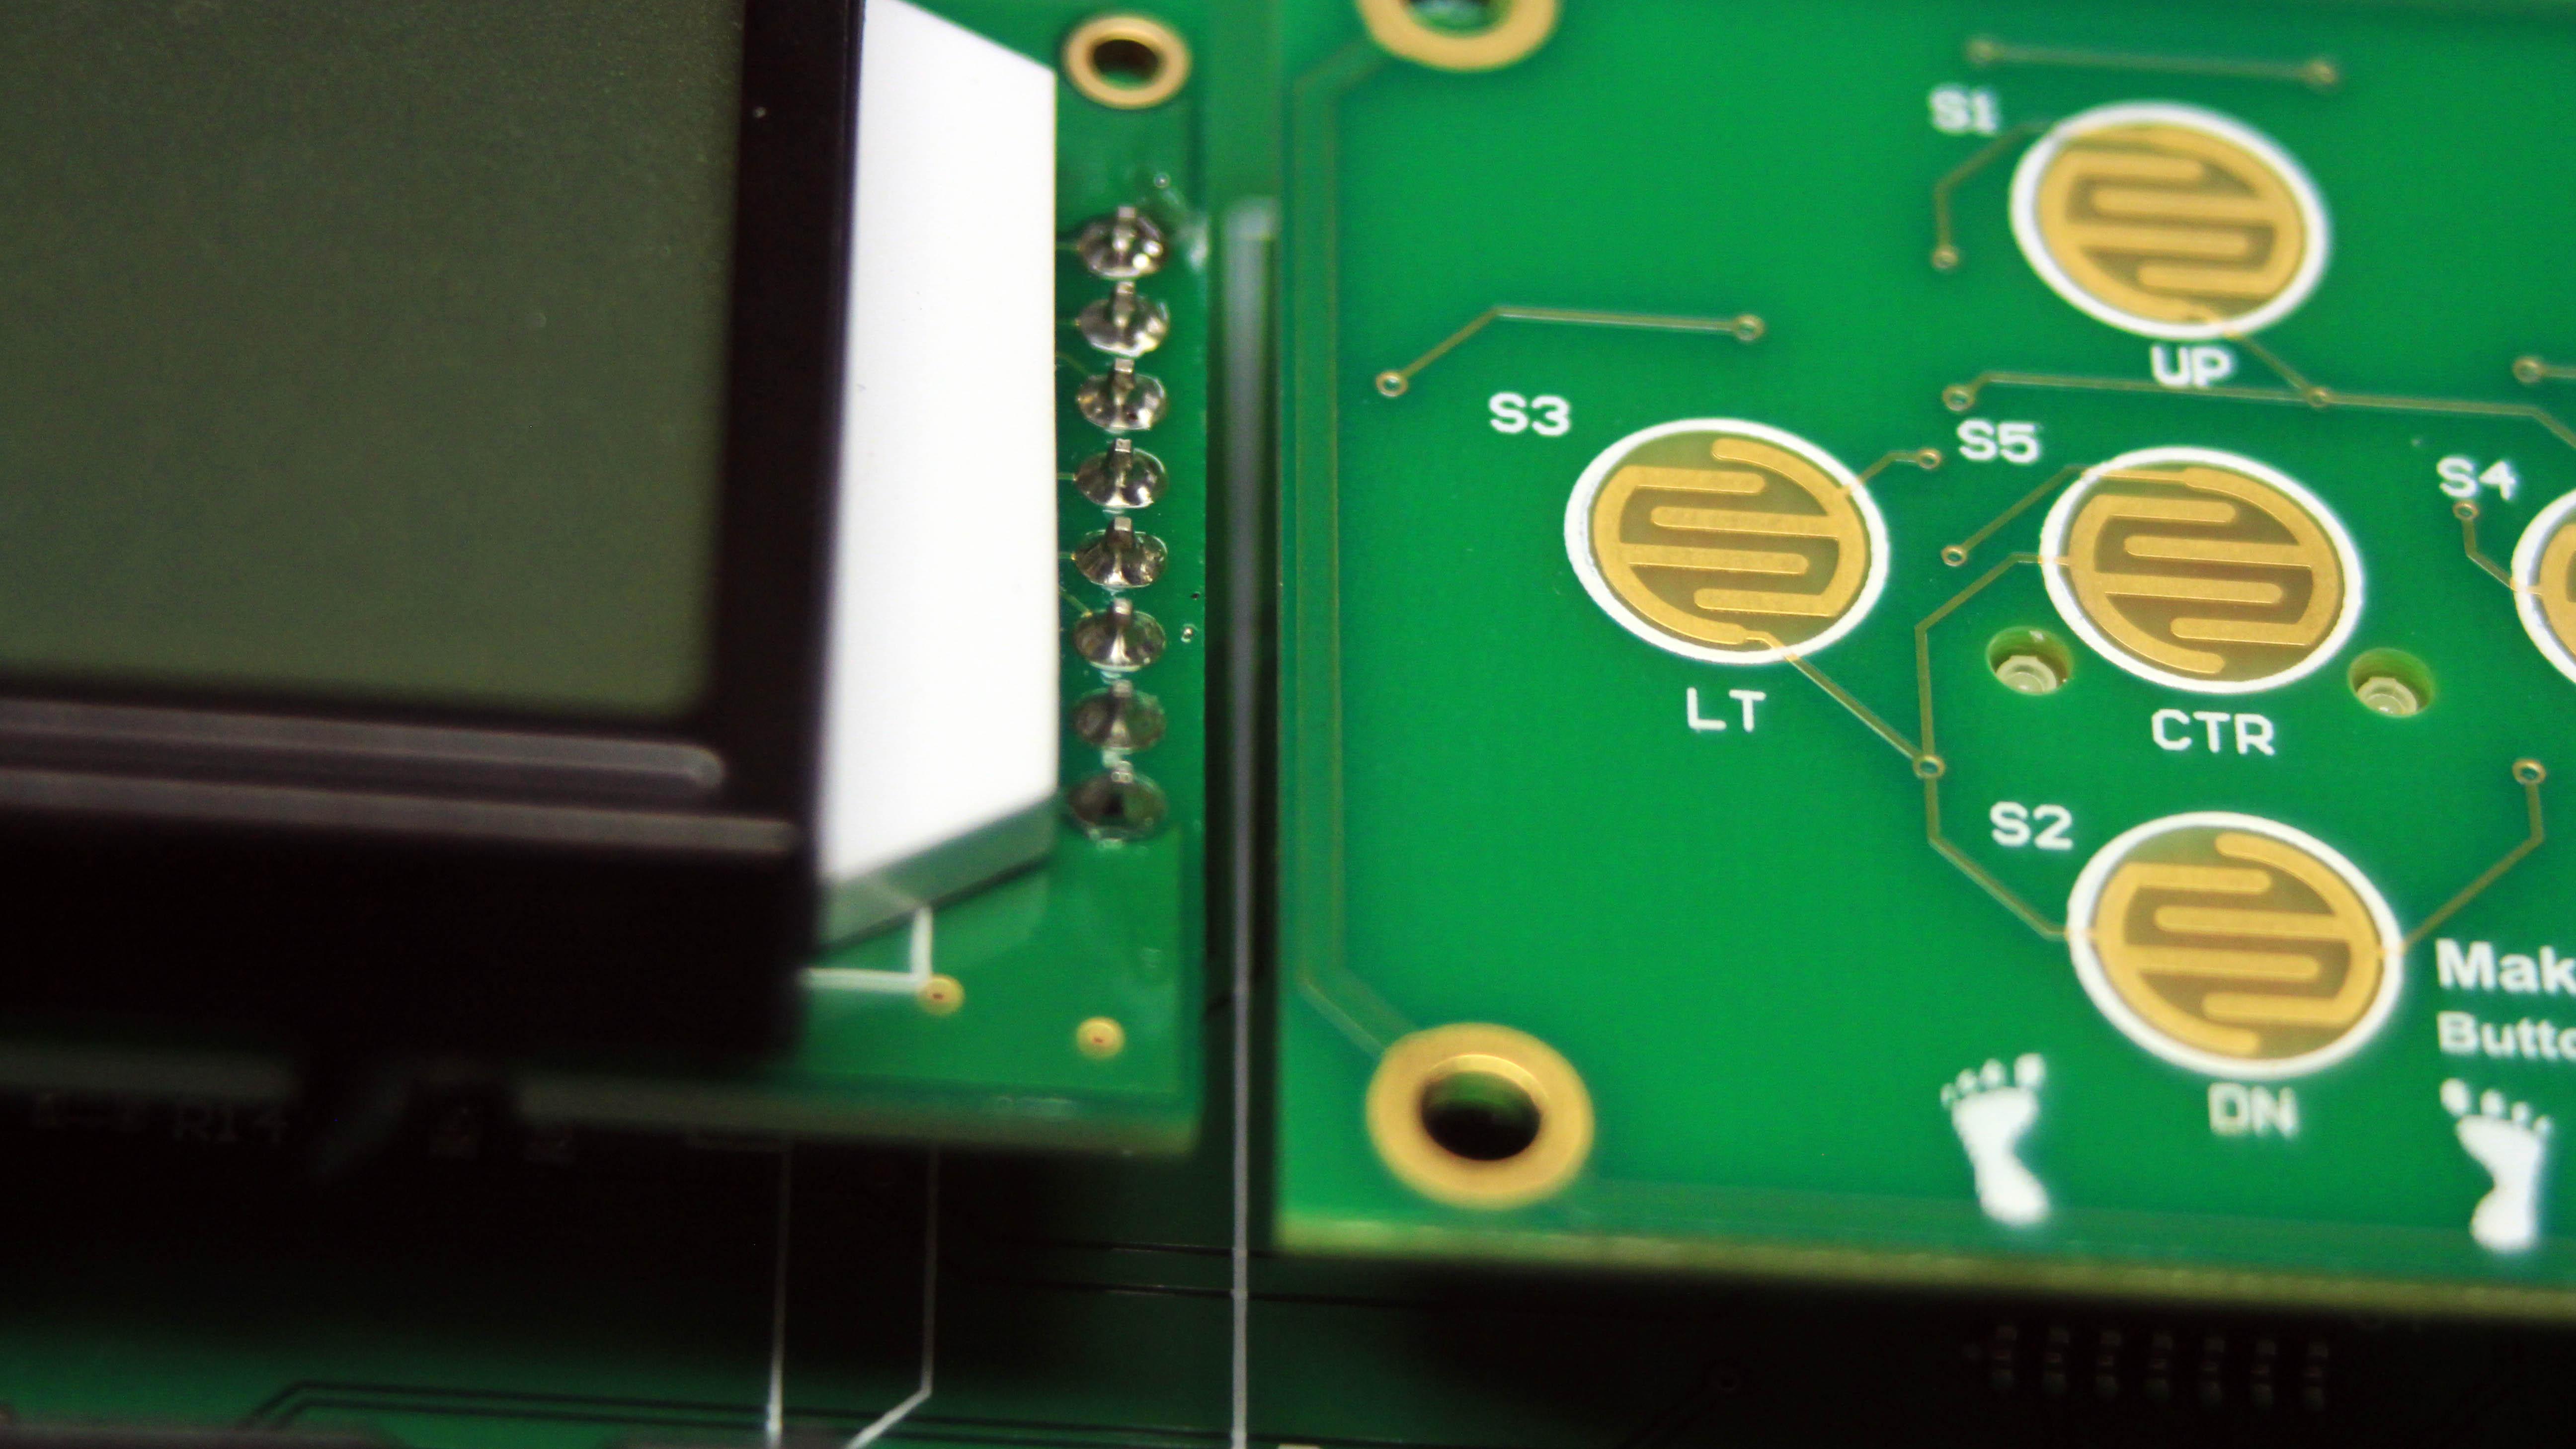 Troubleshooting The Makerbot Replicator 2 Fargo 3d Printing Mendel Circuit Board Spacer Print Models